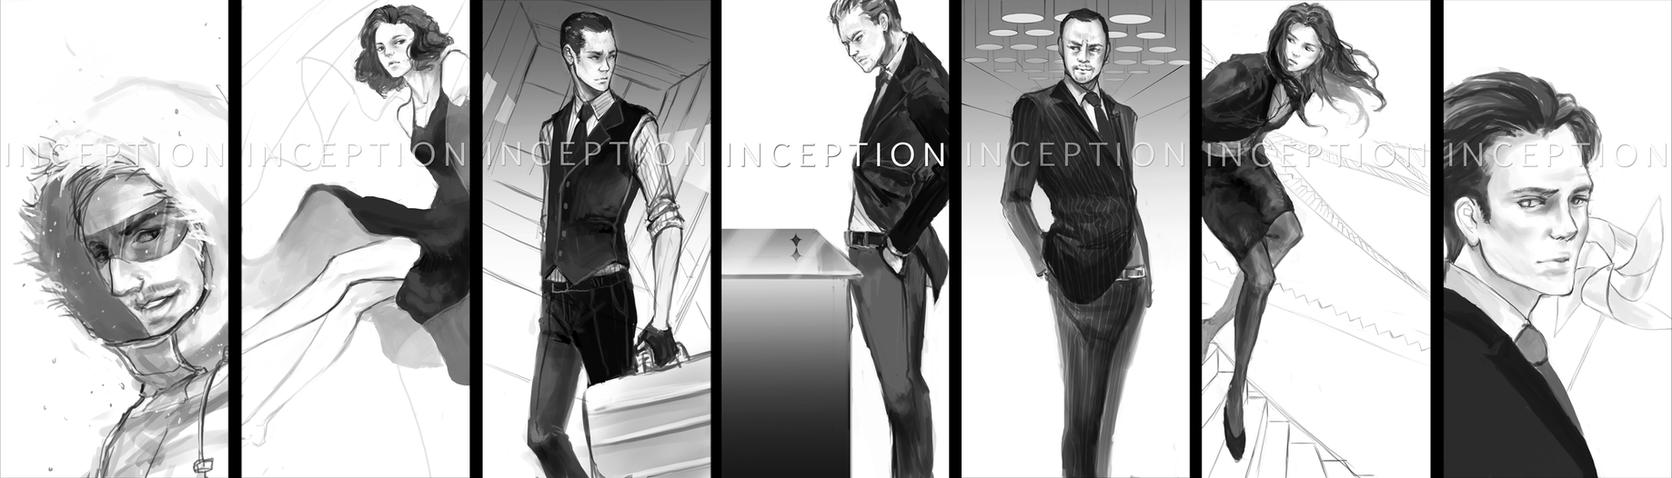 INCEPTION by hakuku